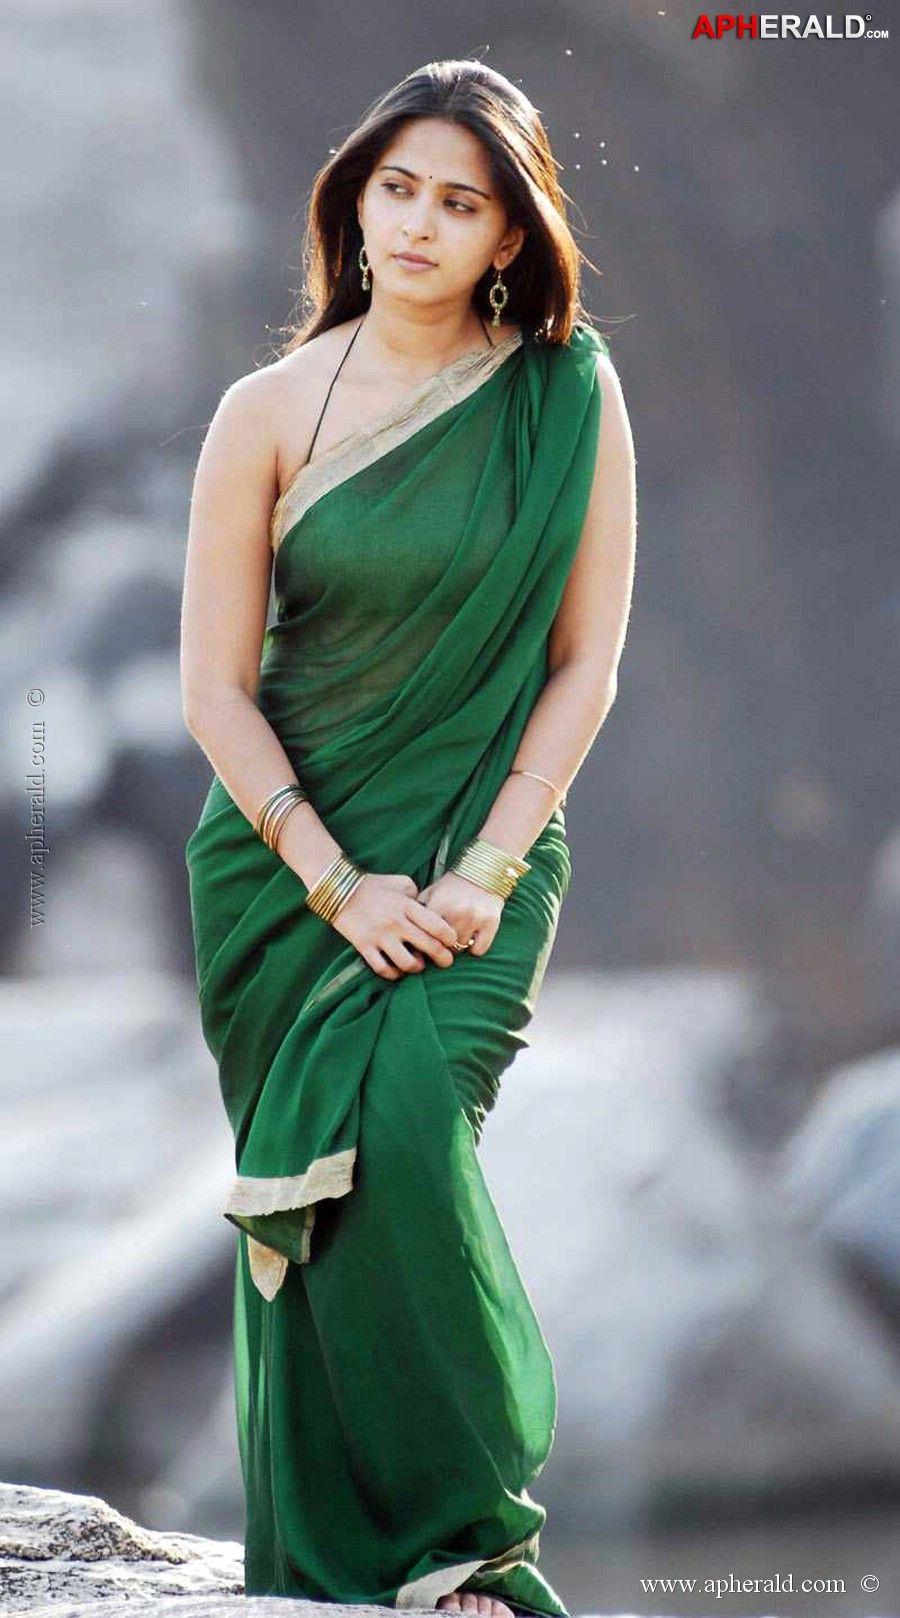 Anushka shetty anushka shetty hot stills pictures beautiful pictures - Anushka Shetty Hot Google Search